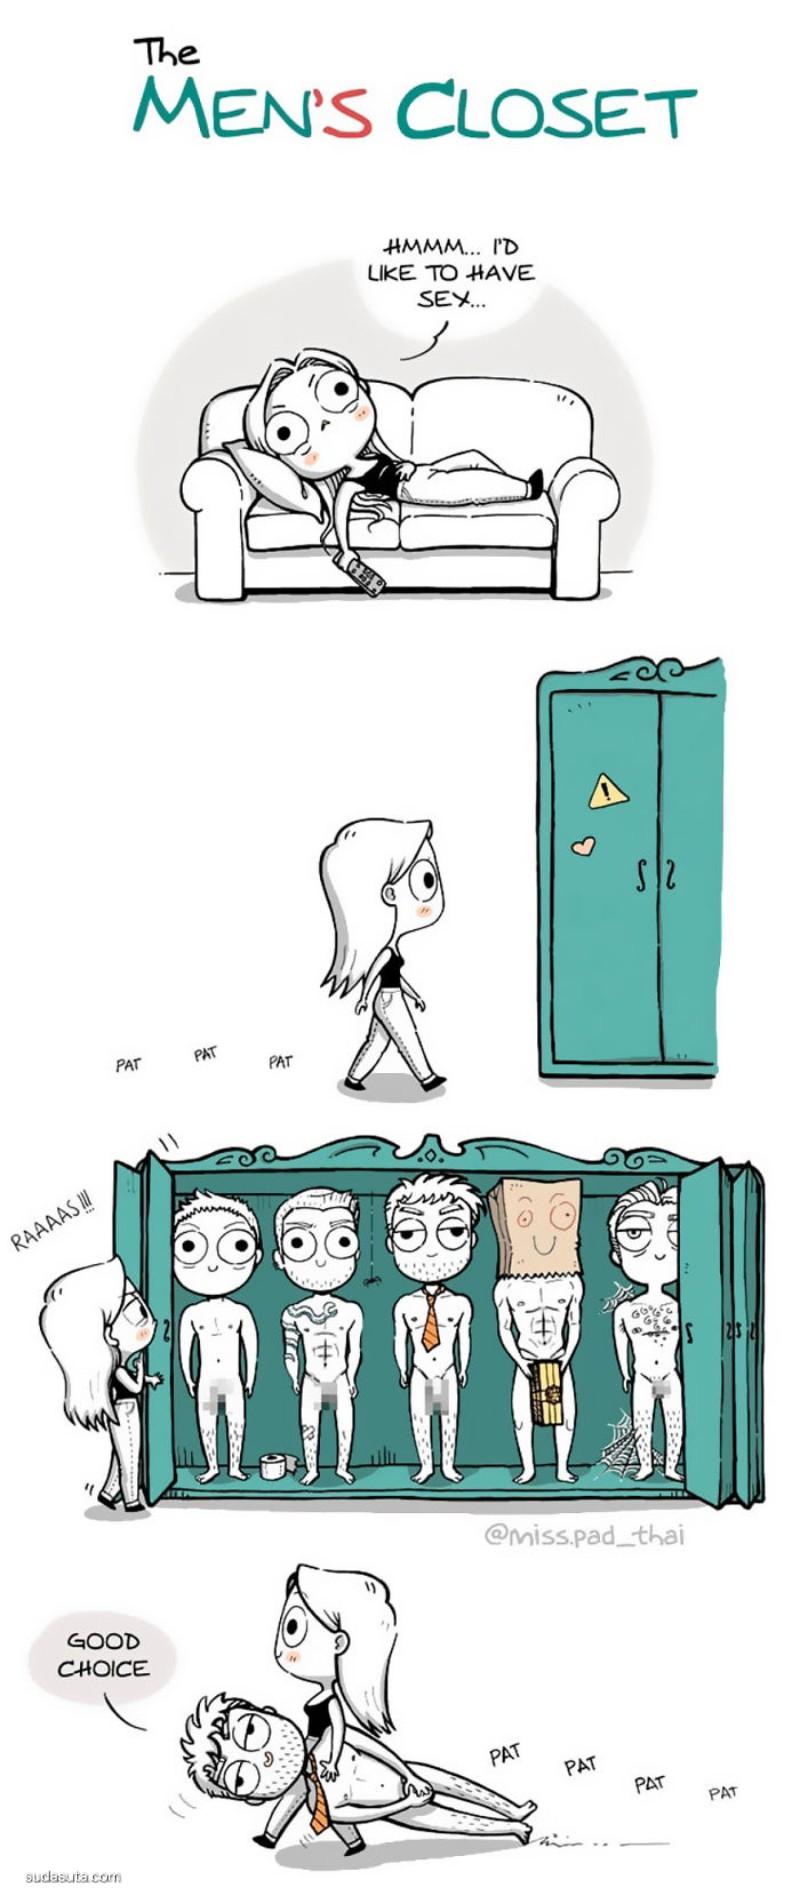 Esther González 可爱而有趣的生活小卡通